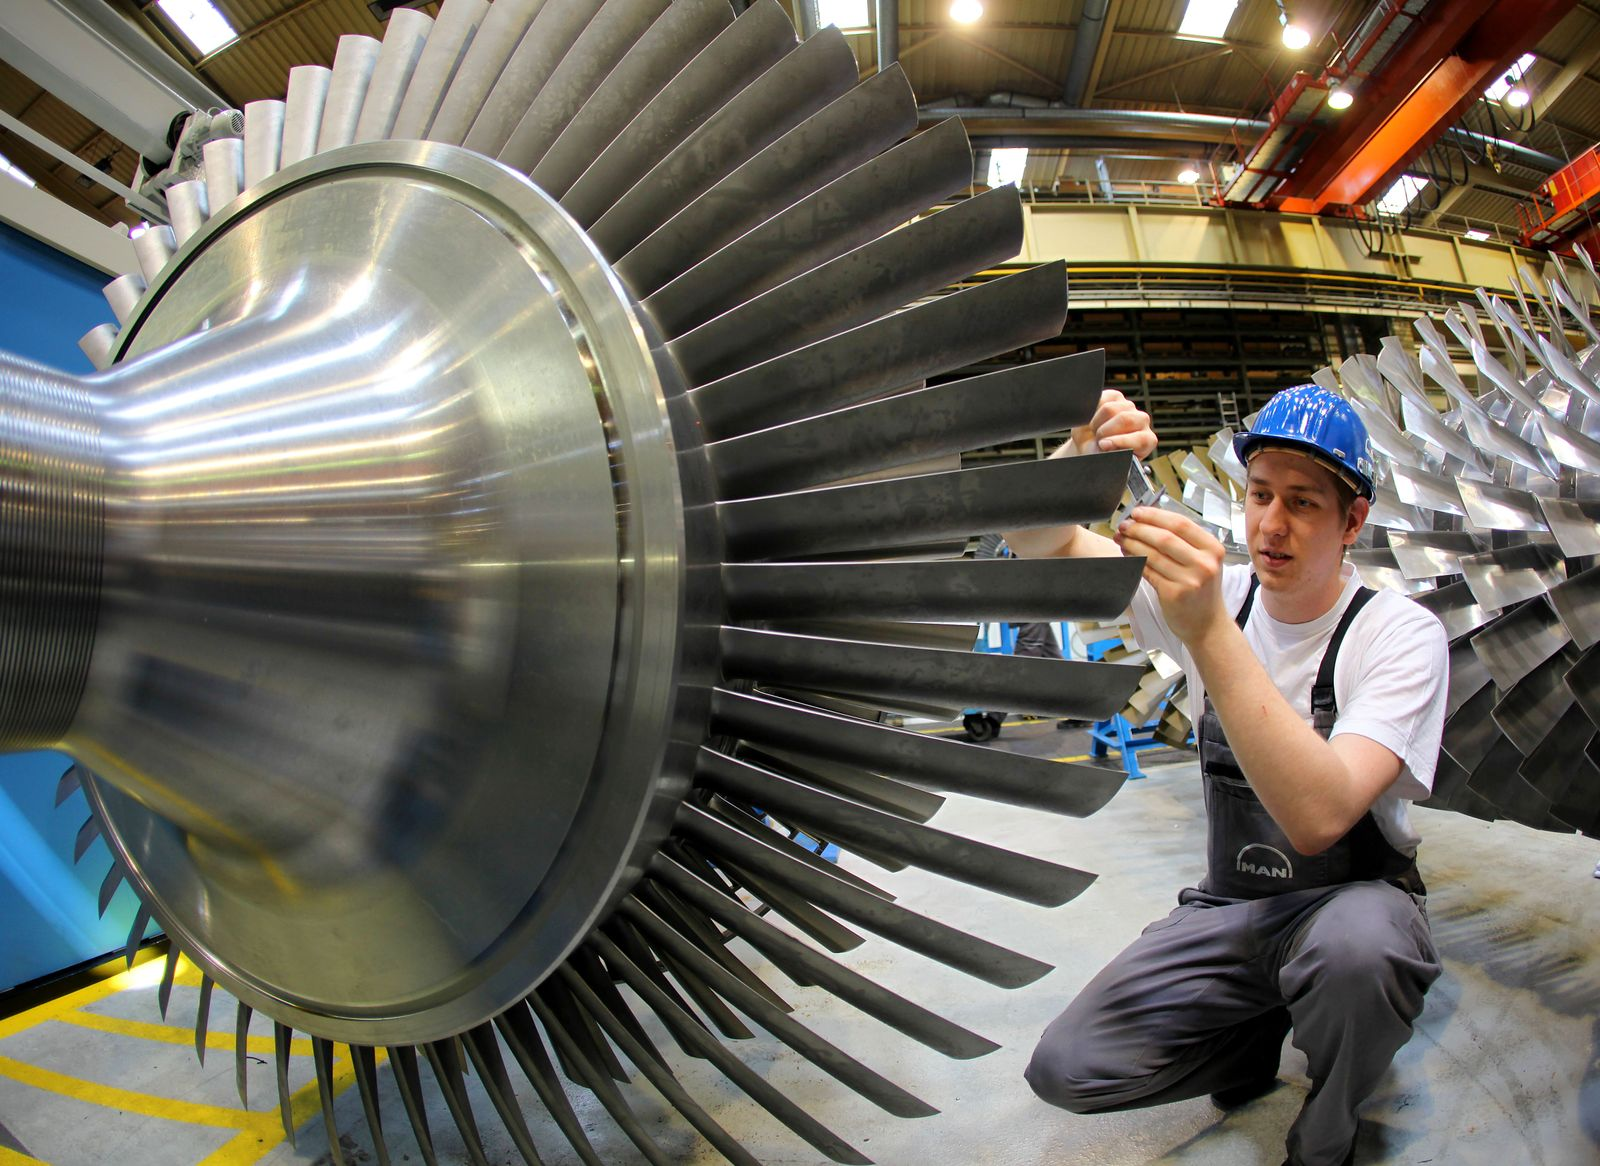 Konjunktur / Turbinenherstellung / Maschinenbau / Fachkräfte / Ingenieurin / Techniker / Mechaniker